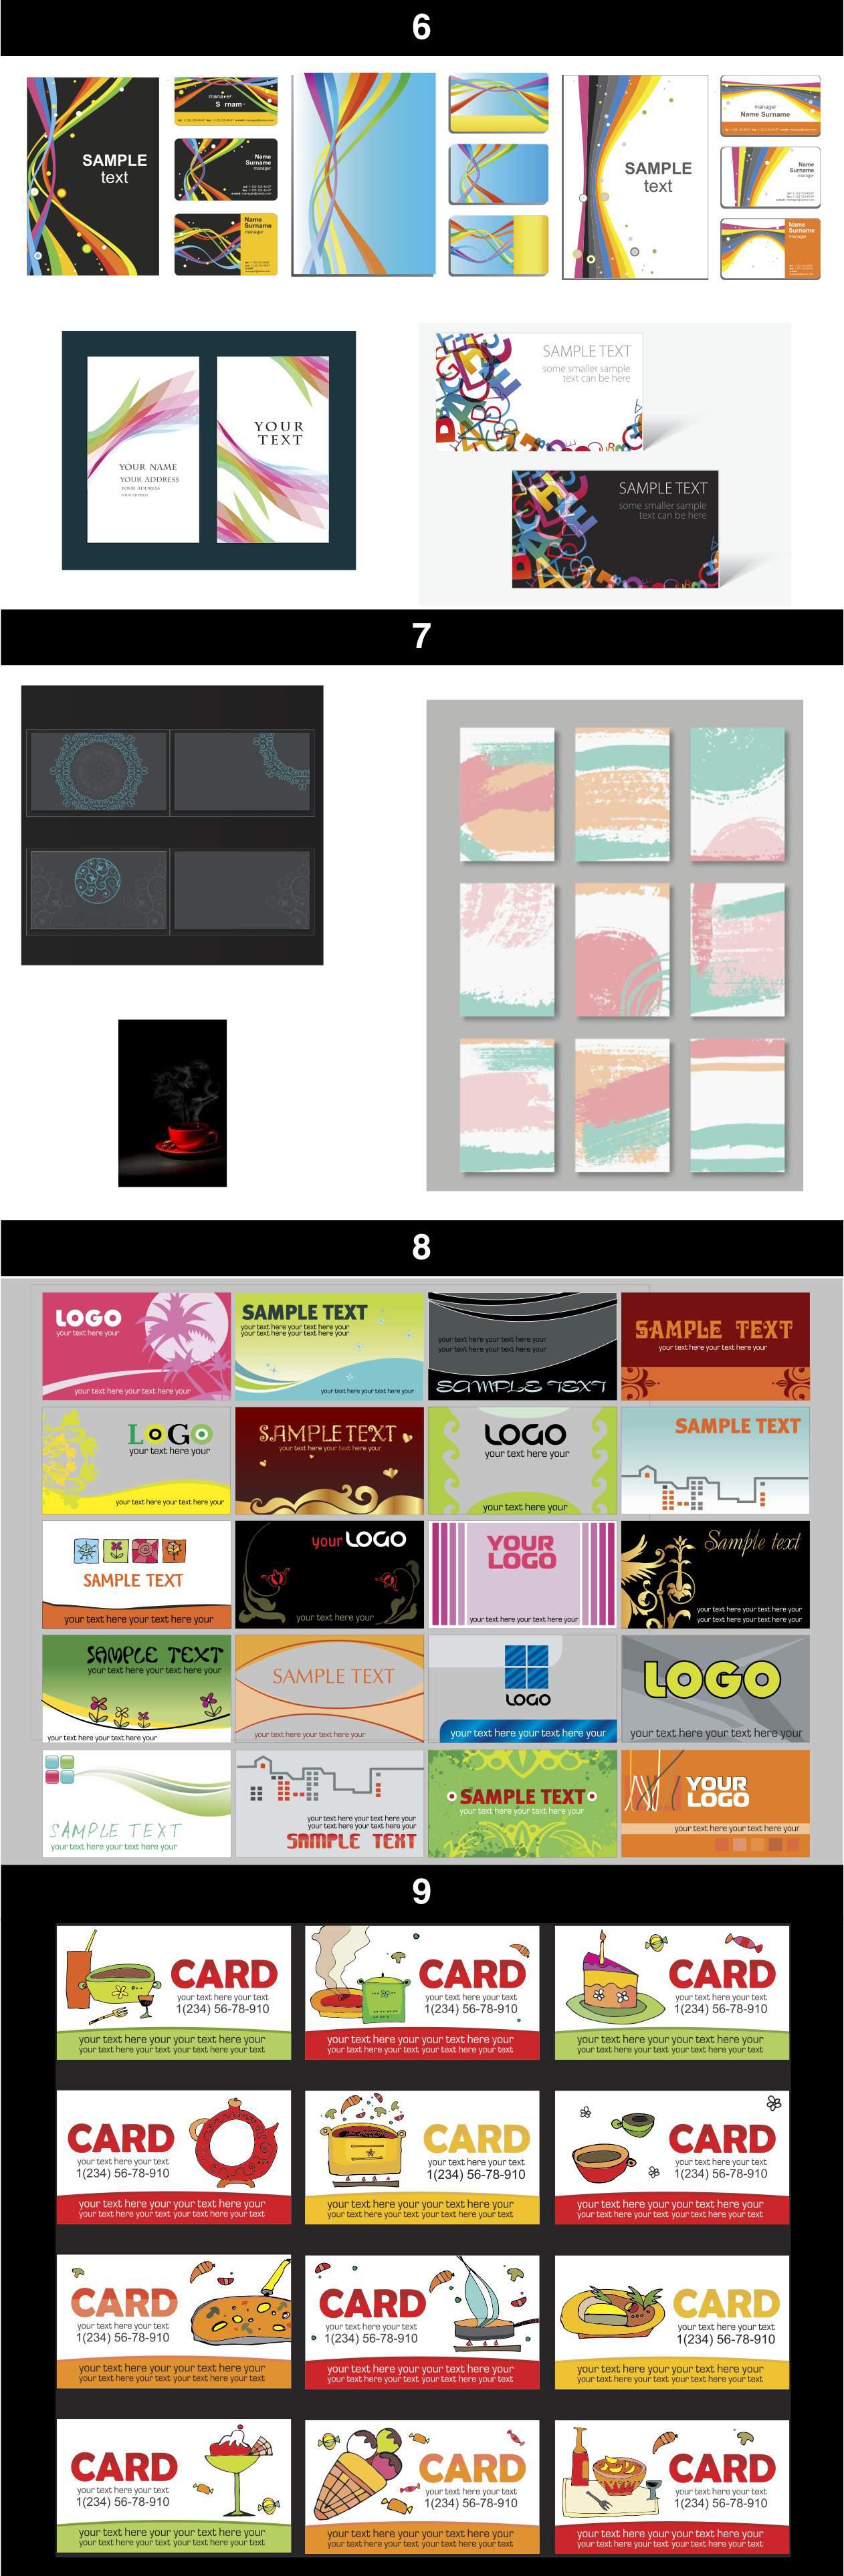 Biz card samples 2-Layout 1 2